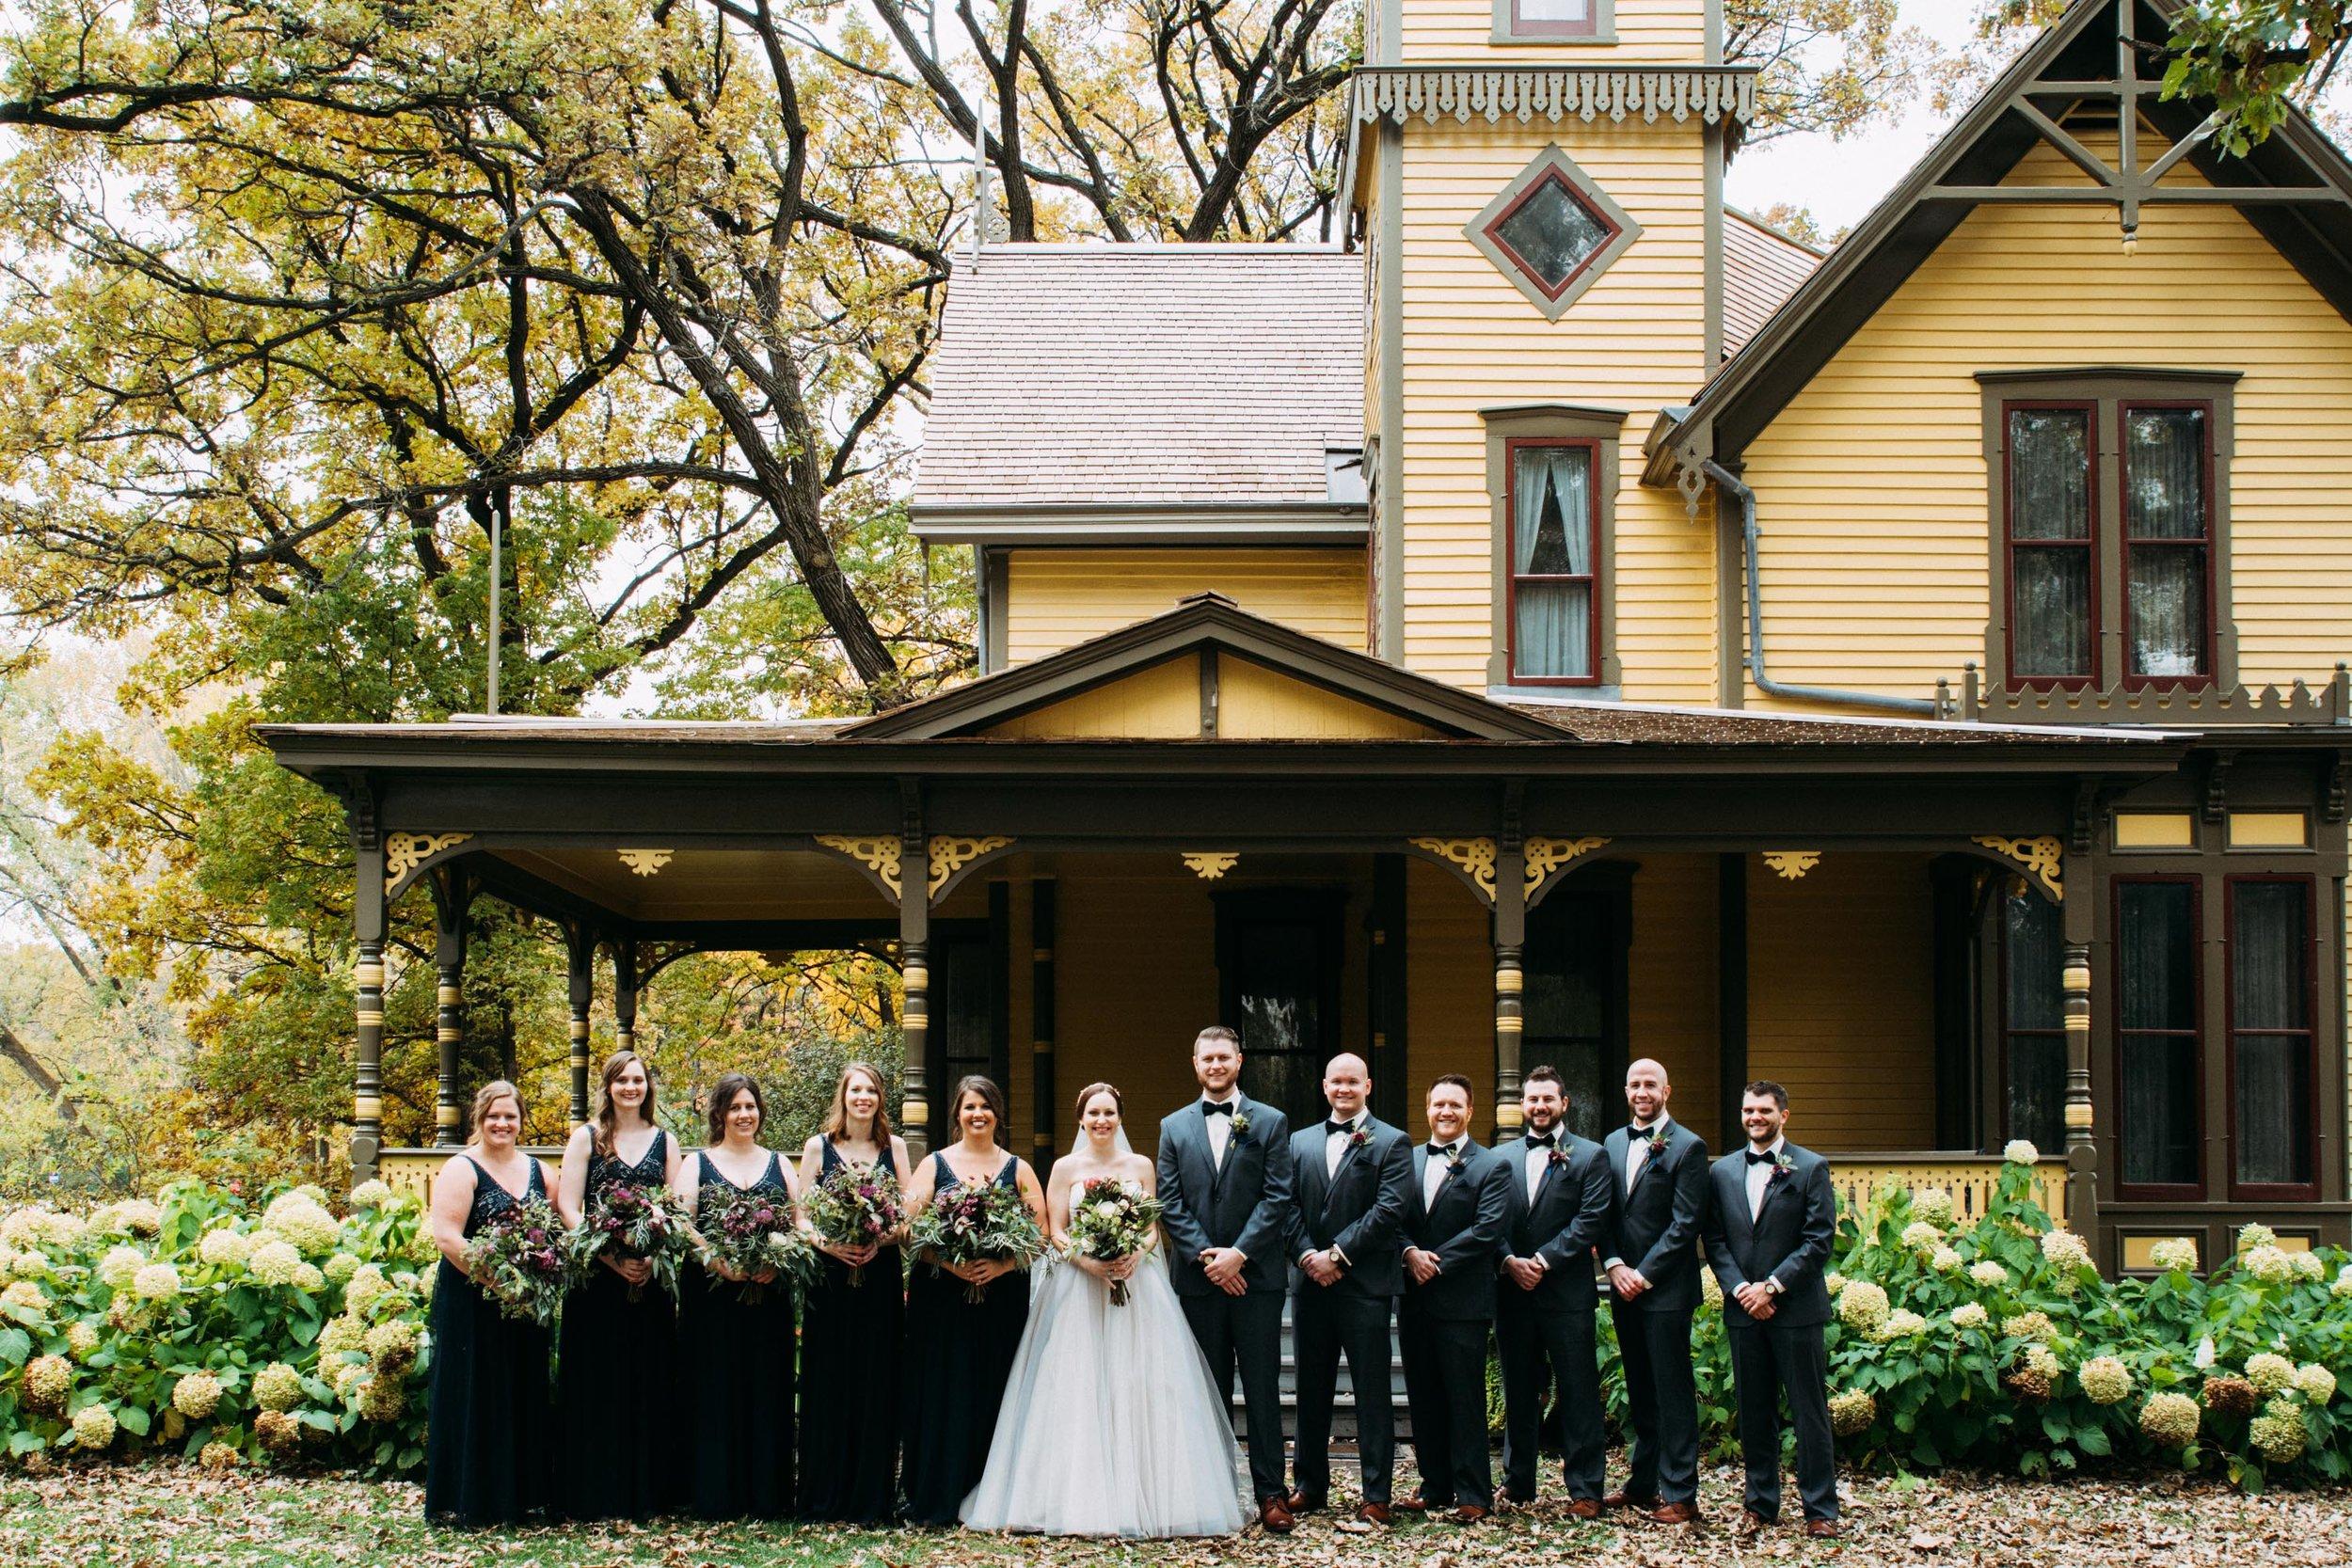 17-Sara_Tom_Wedding_Party_Portraits_Minneapolis_Wedding.jpg